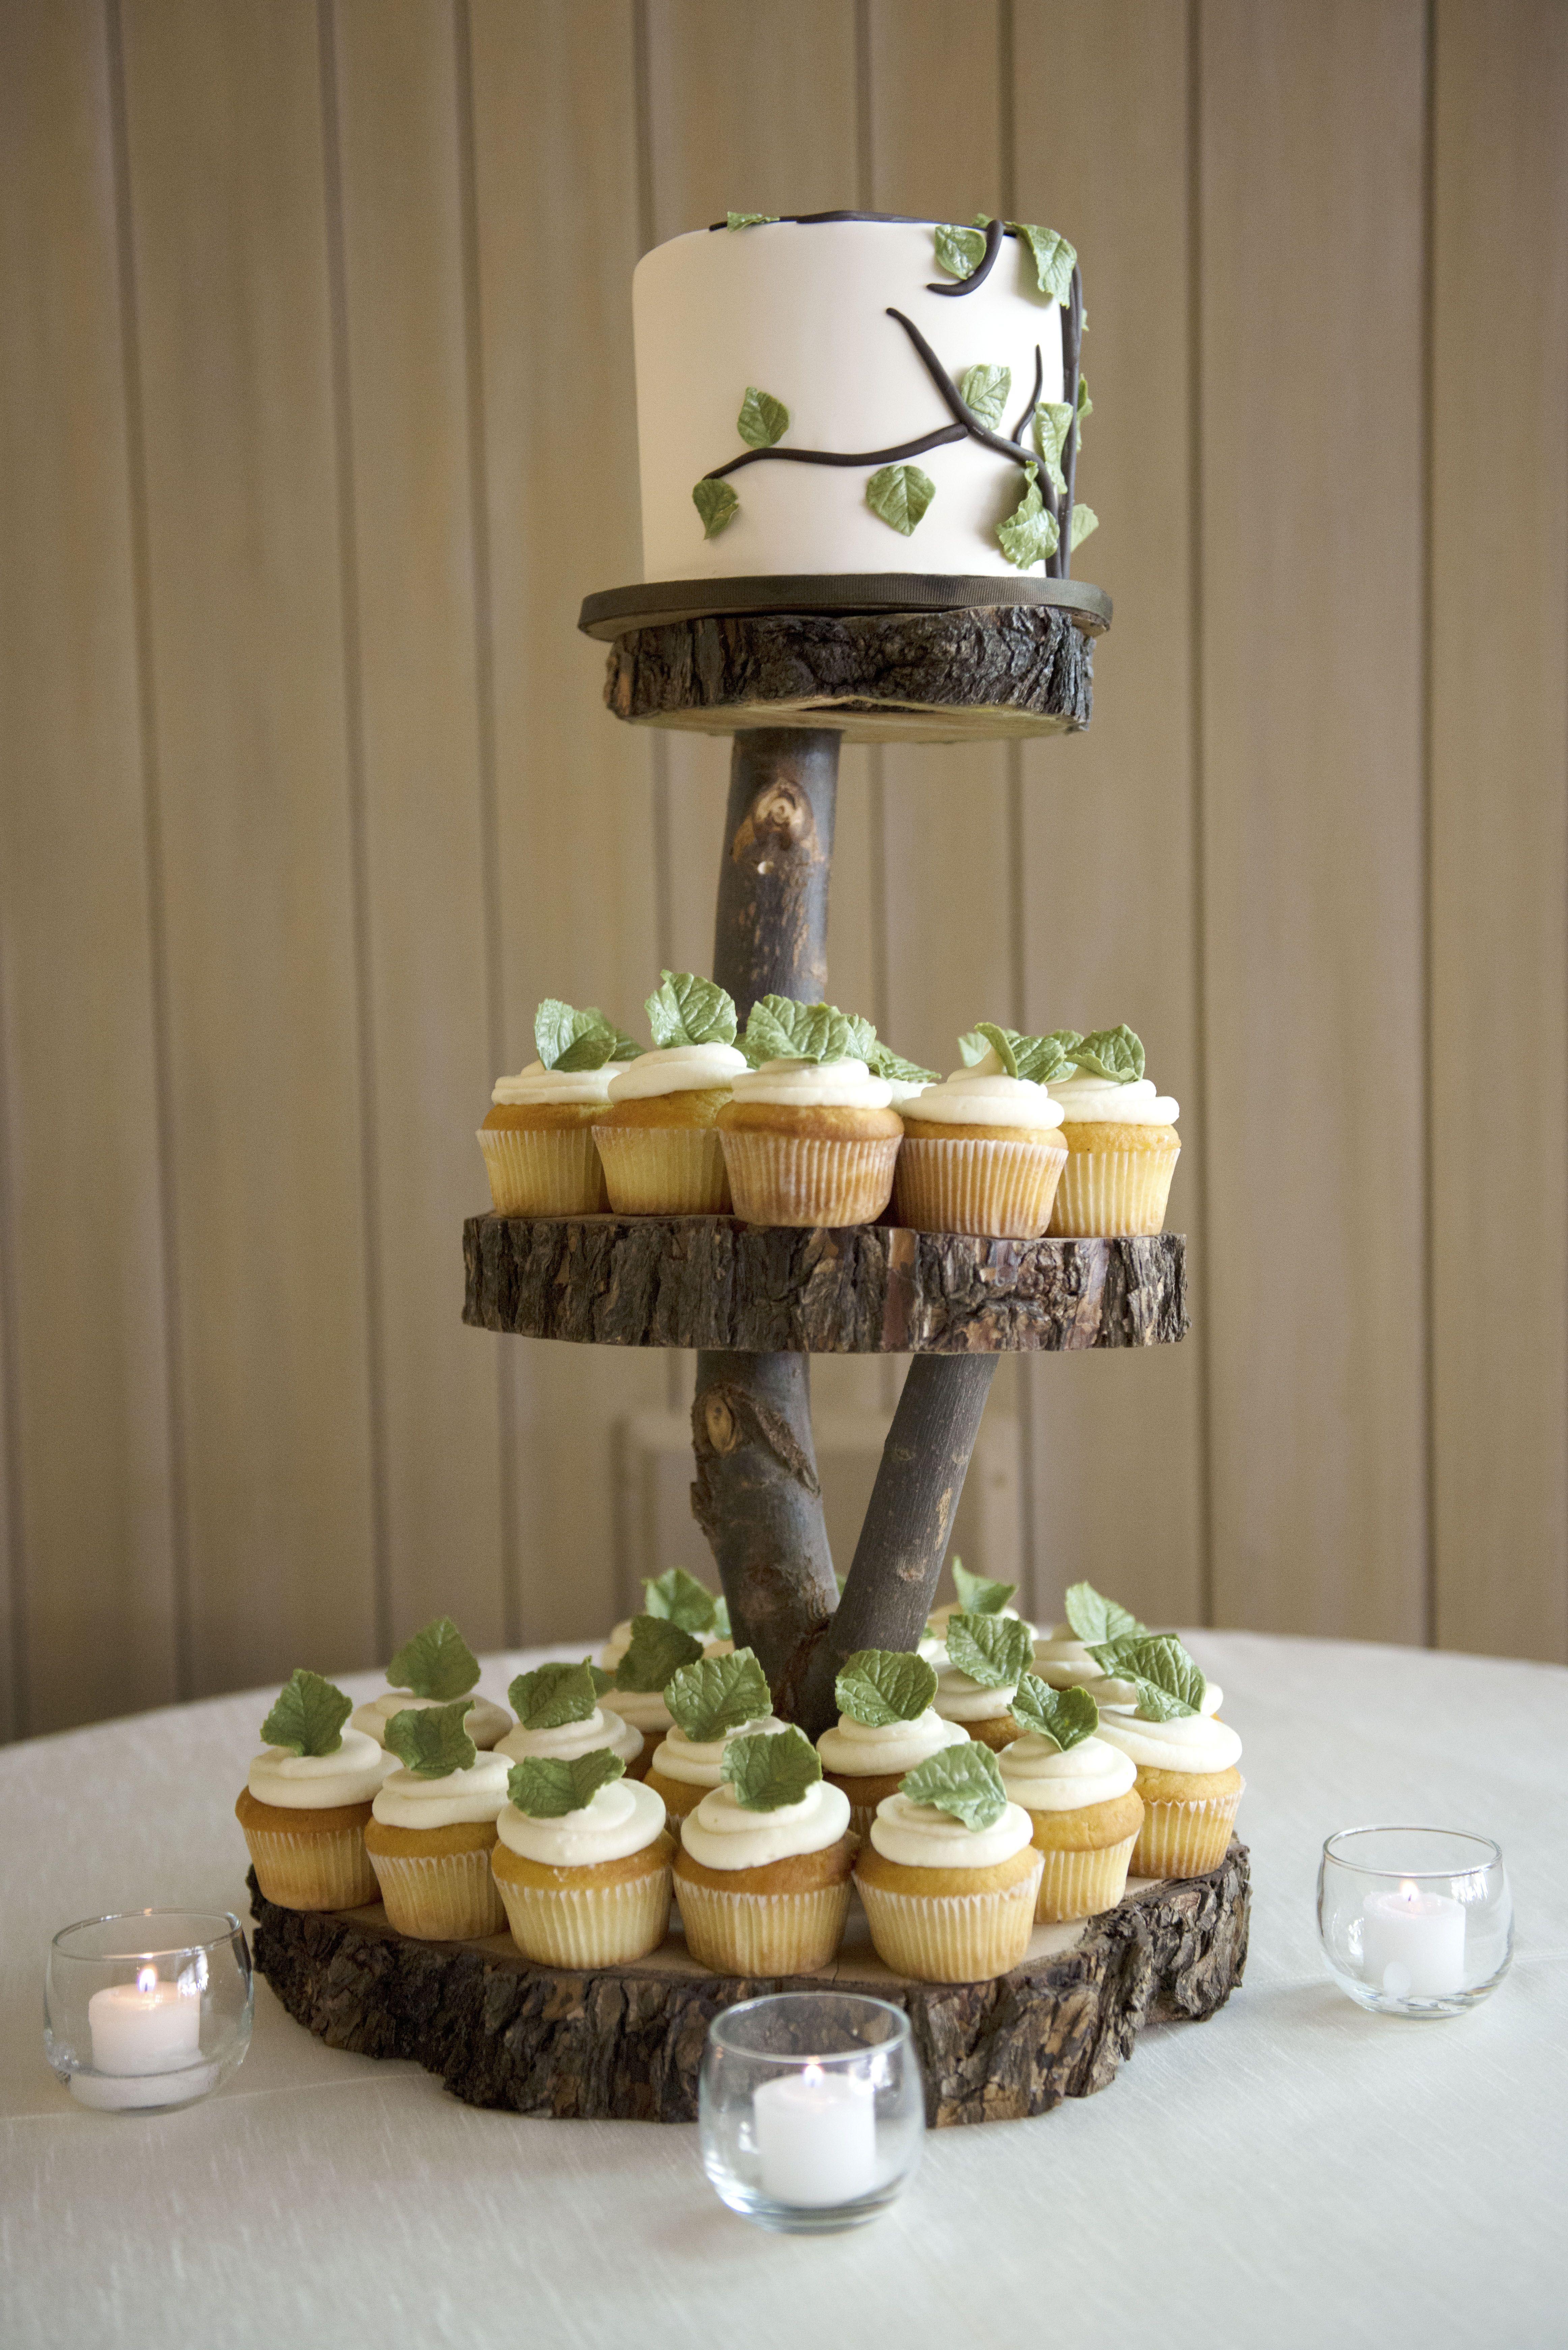 Fun Aspen Themed Wedding Cake Display From A Past Bluebird